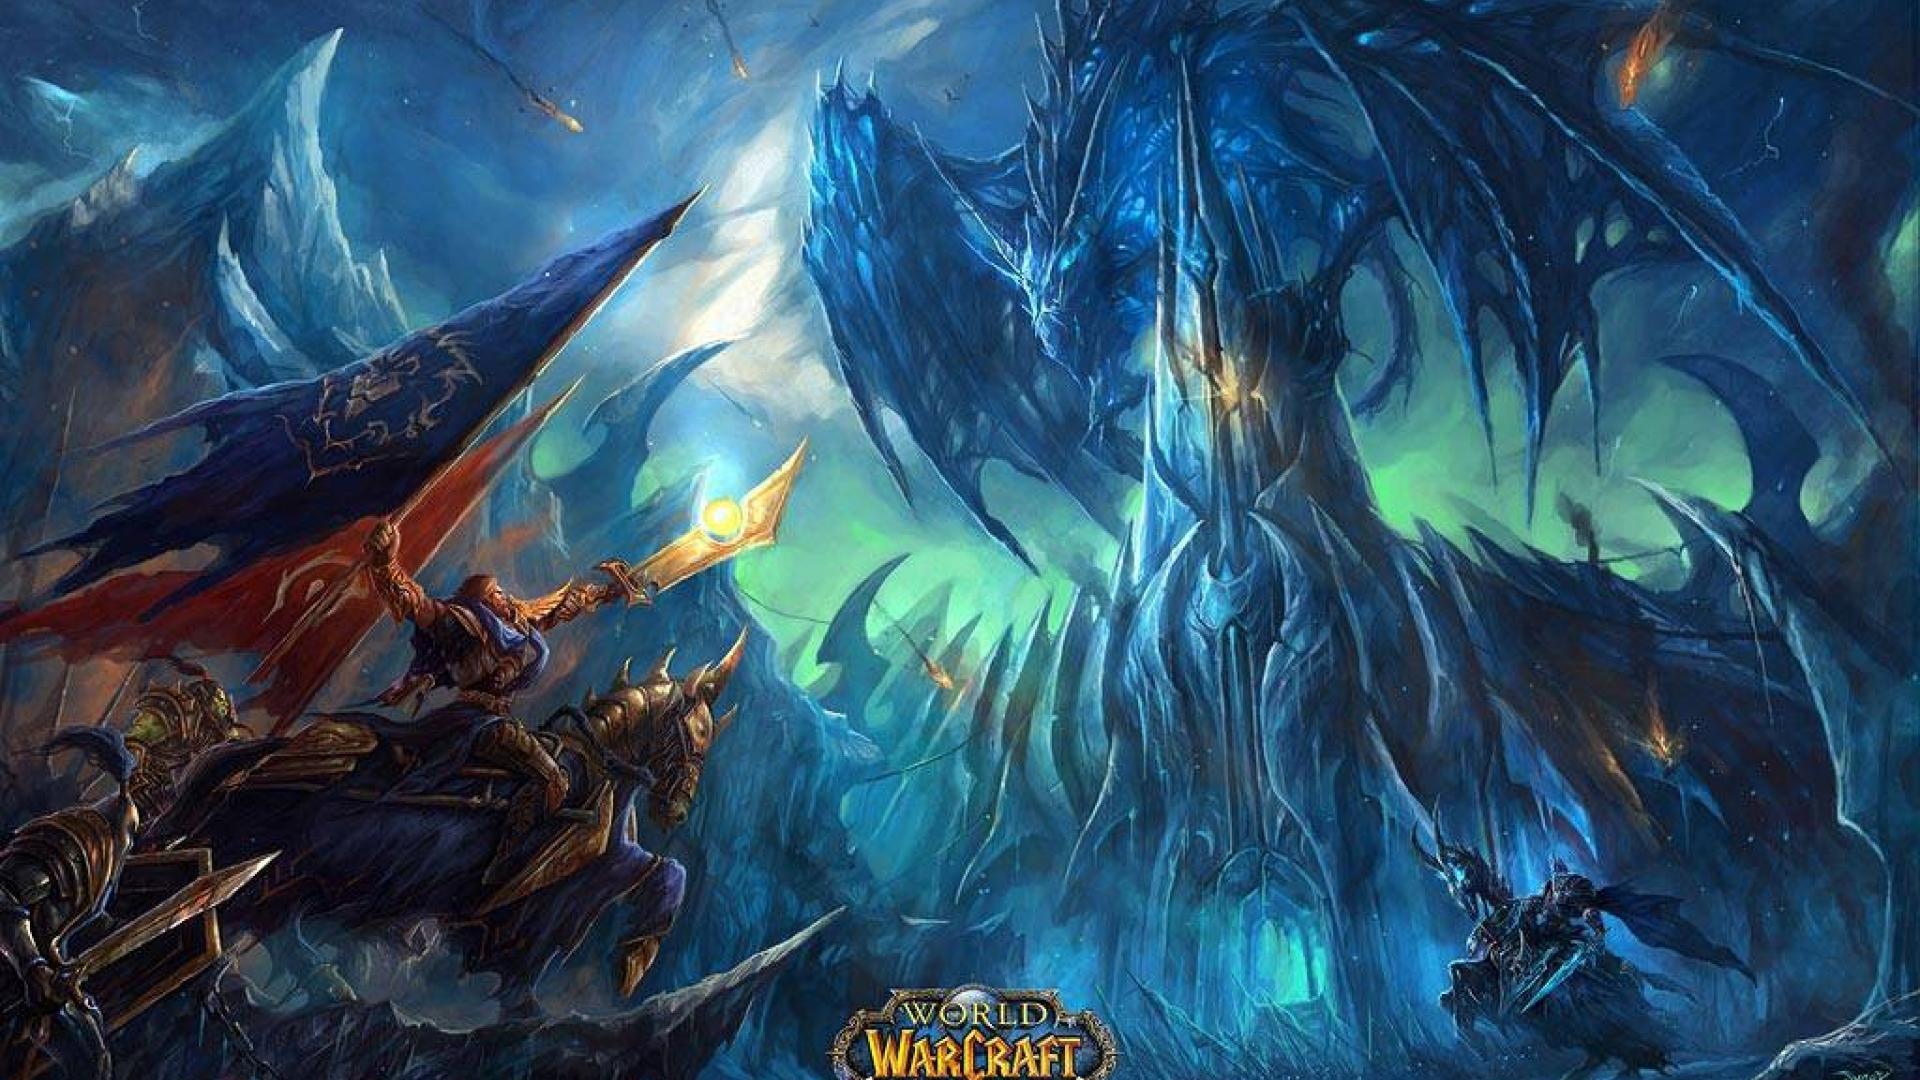 1000+ ideas about World Of Warcraft Wallpaper on Pinterest | World